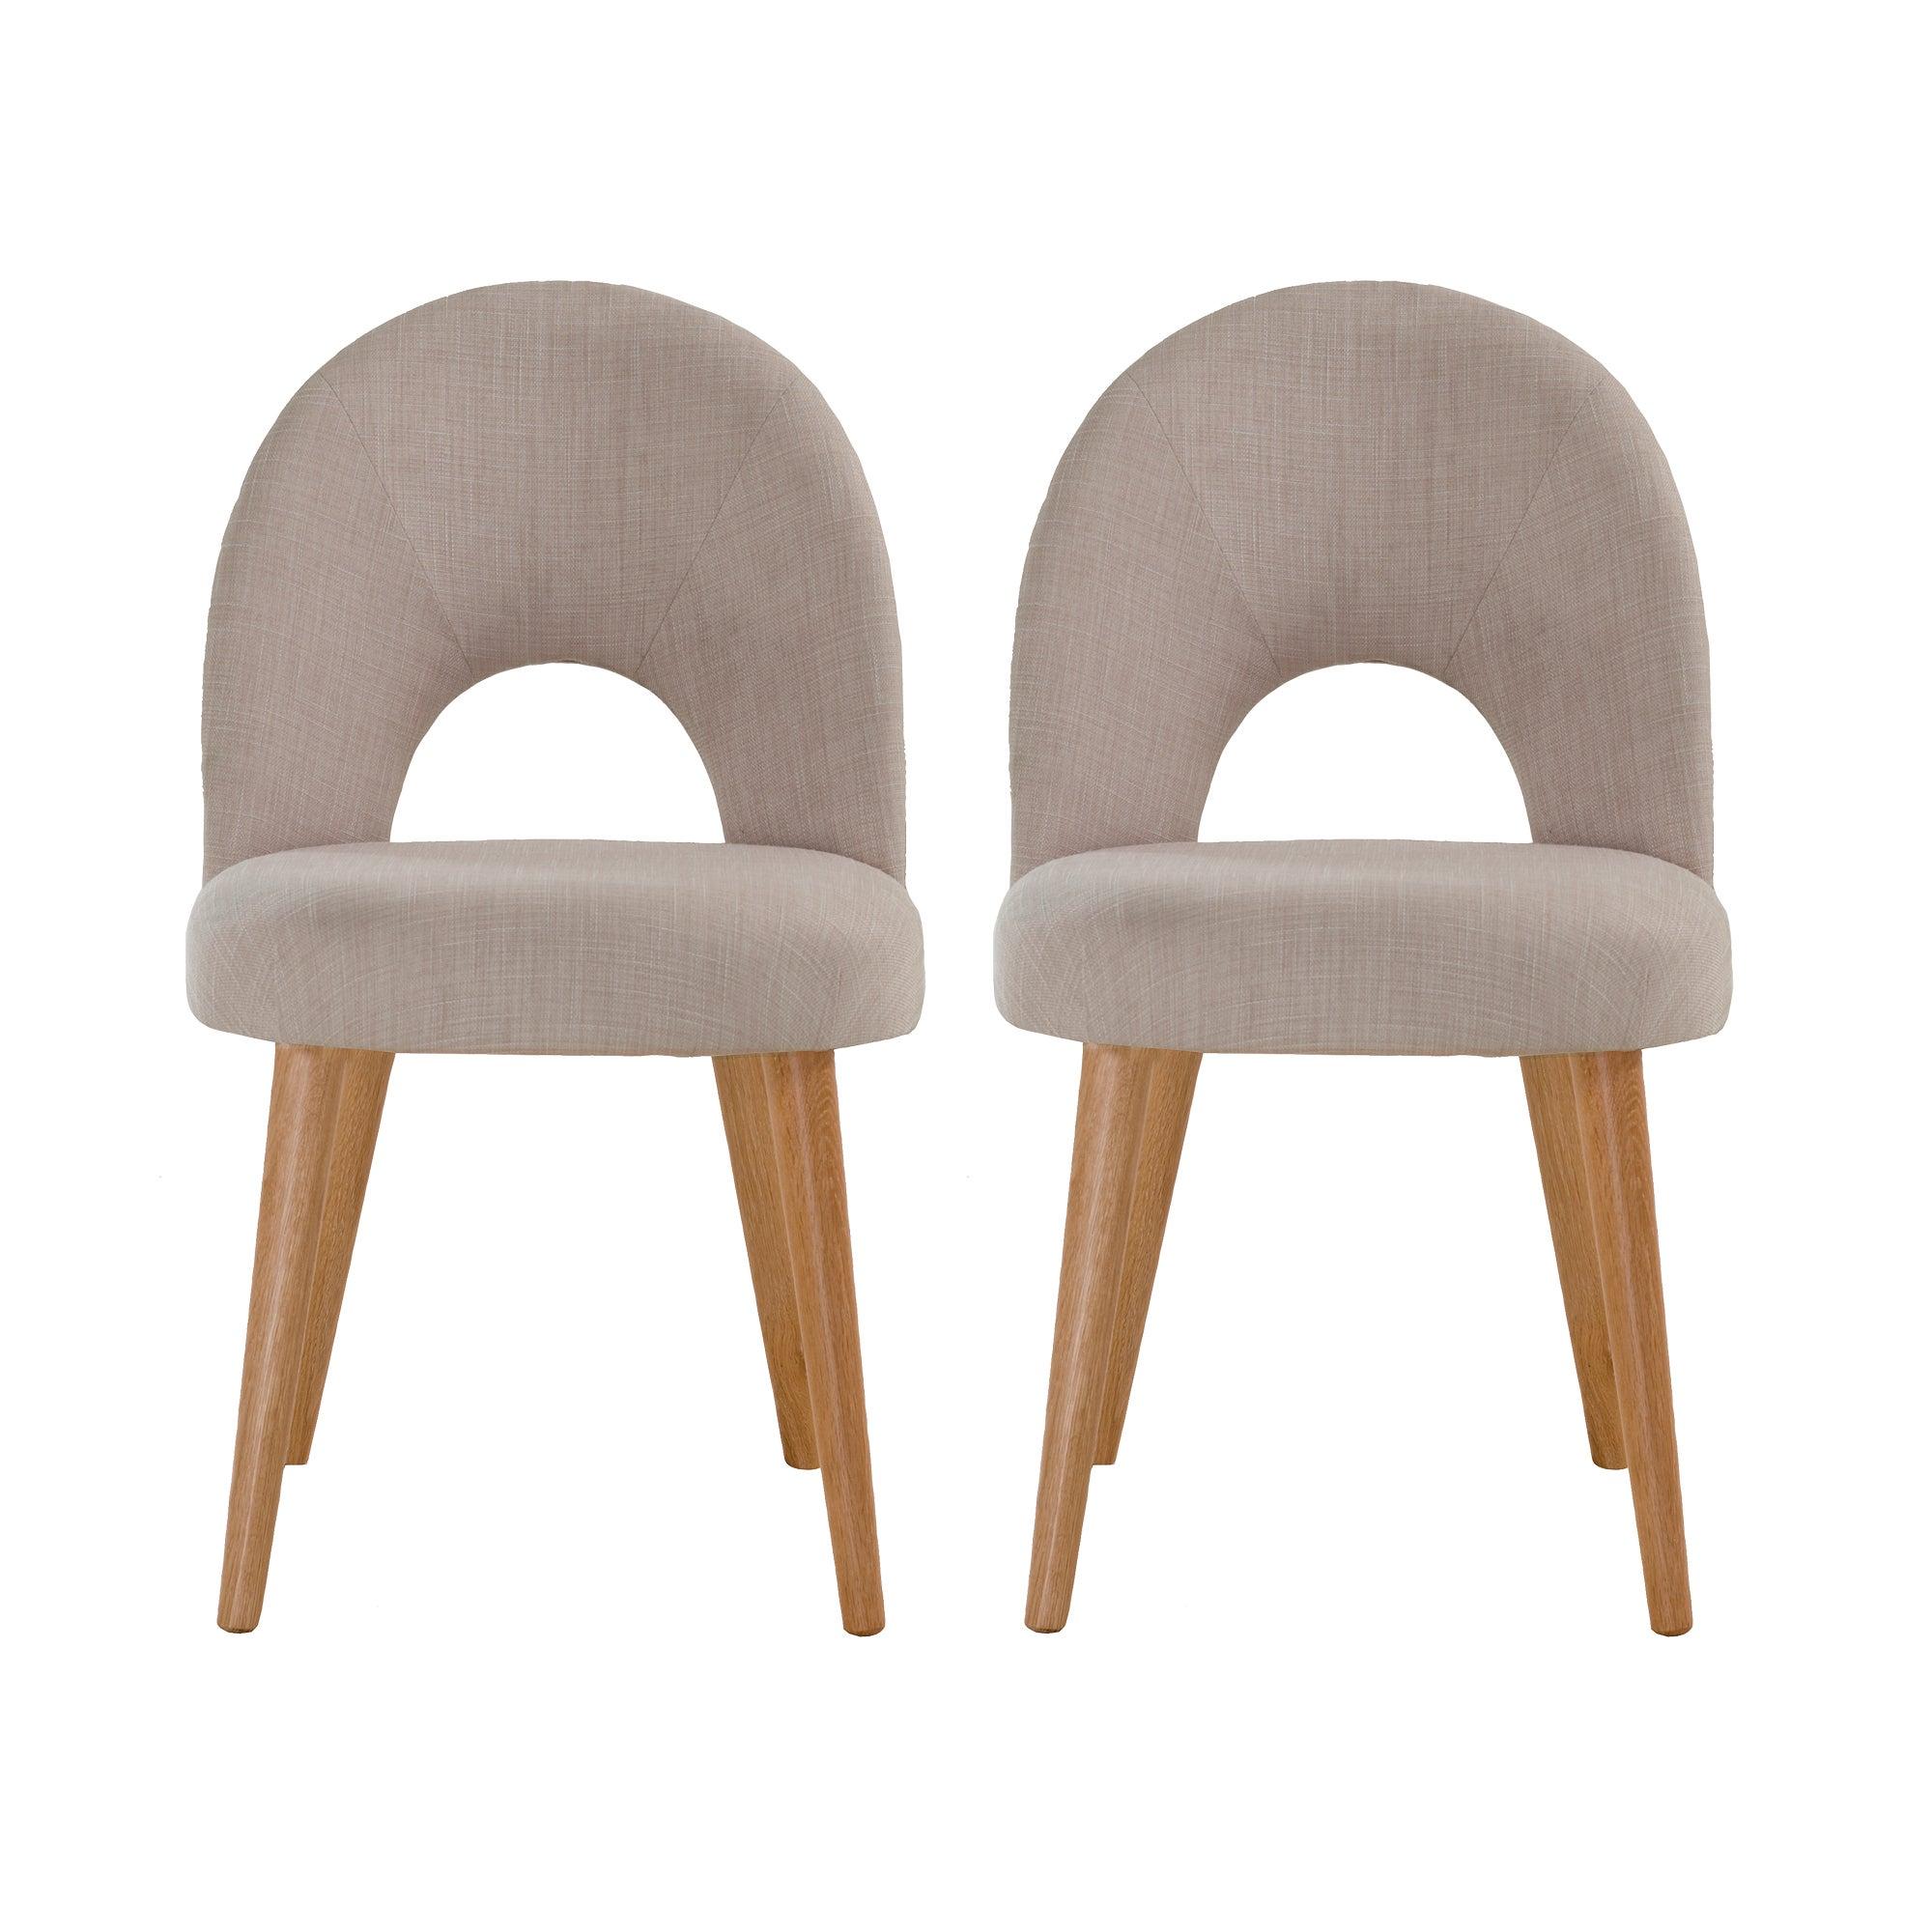 skandi oak pair of upholstered chairs dunelm. Black Bedroom Furniture Sets. Home Design Ideas